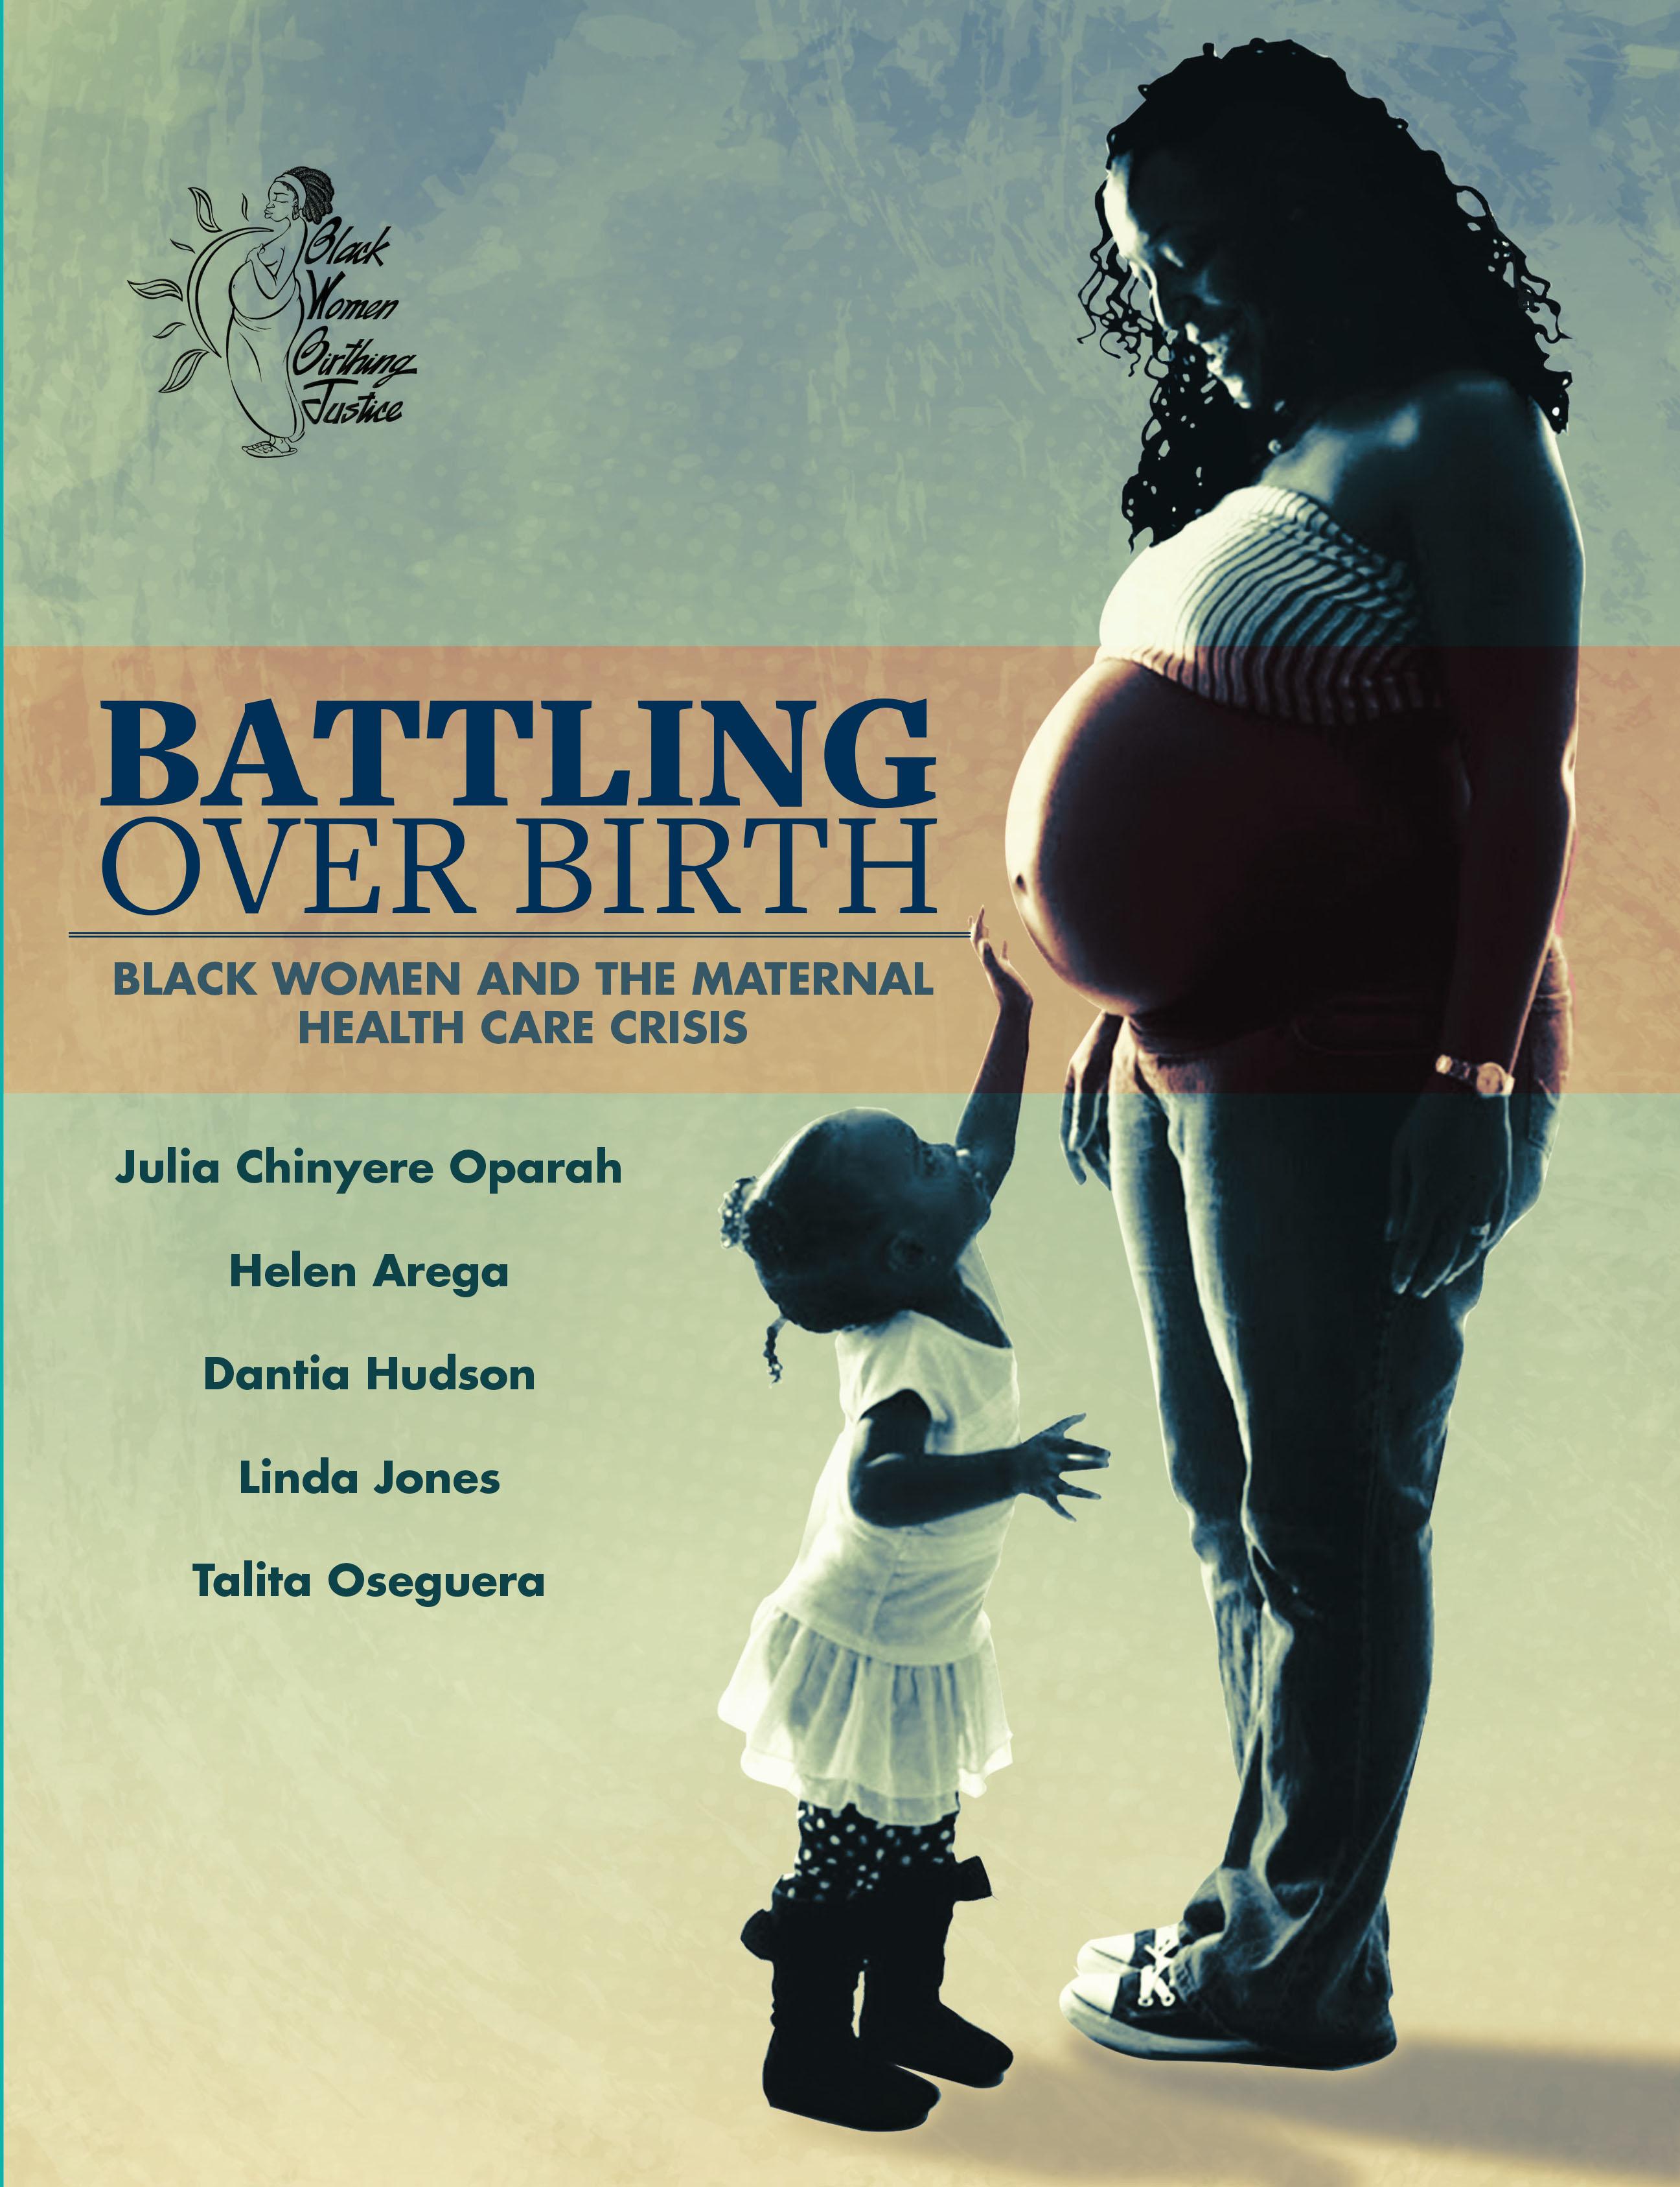 batlling-over-birth-cover-11-28.jpg